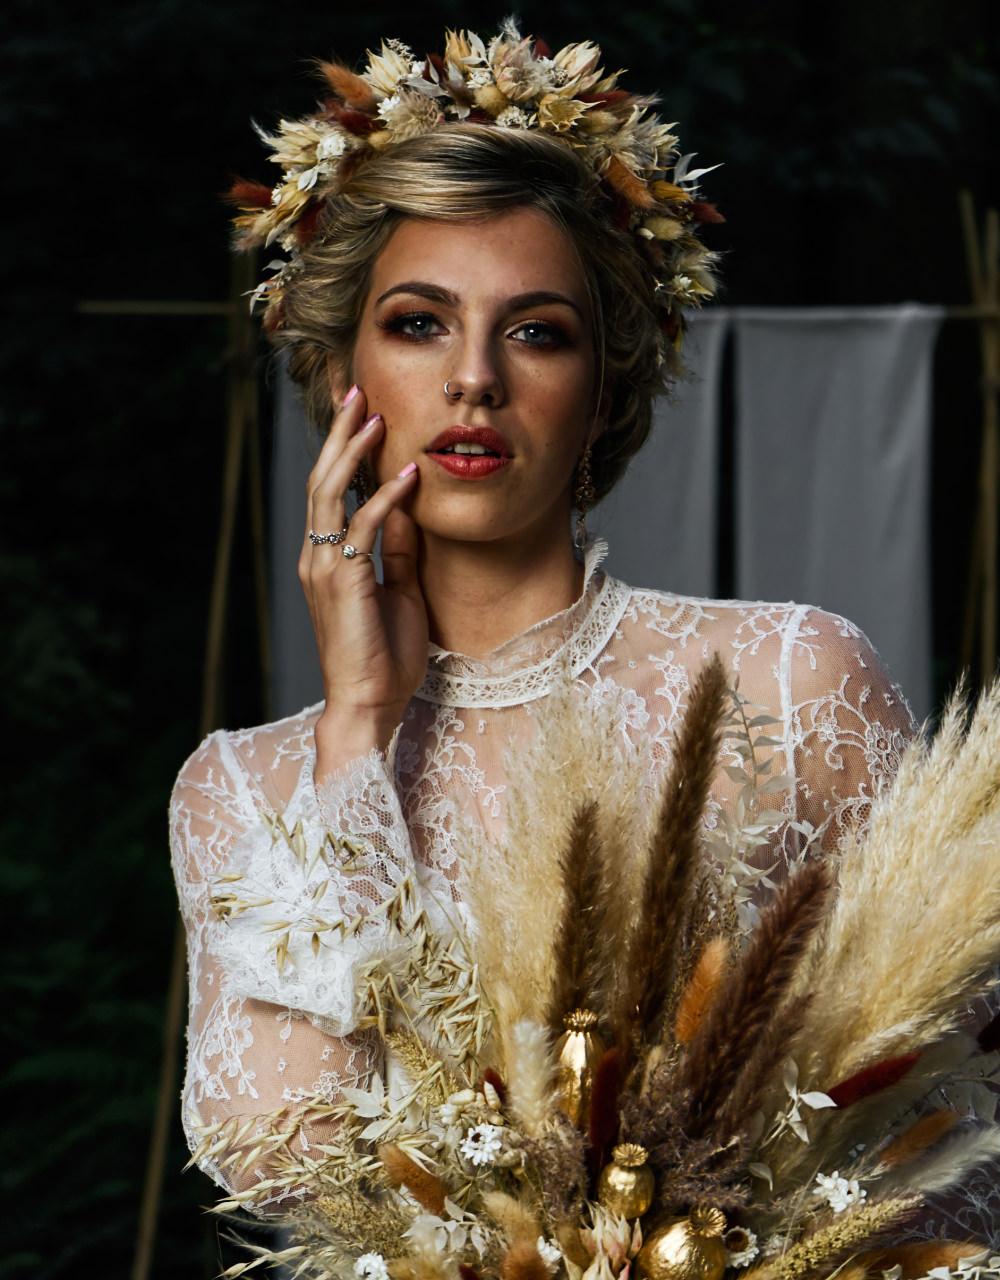 Pampas Grass Bouquet Flowers Bride Bridal Dried Flowers Flower Crown Moroccan Wedding Inspiration Luke Batchelor Productions